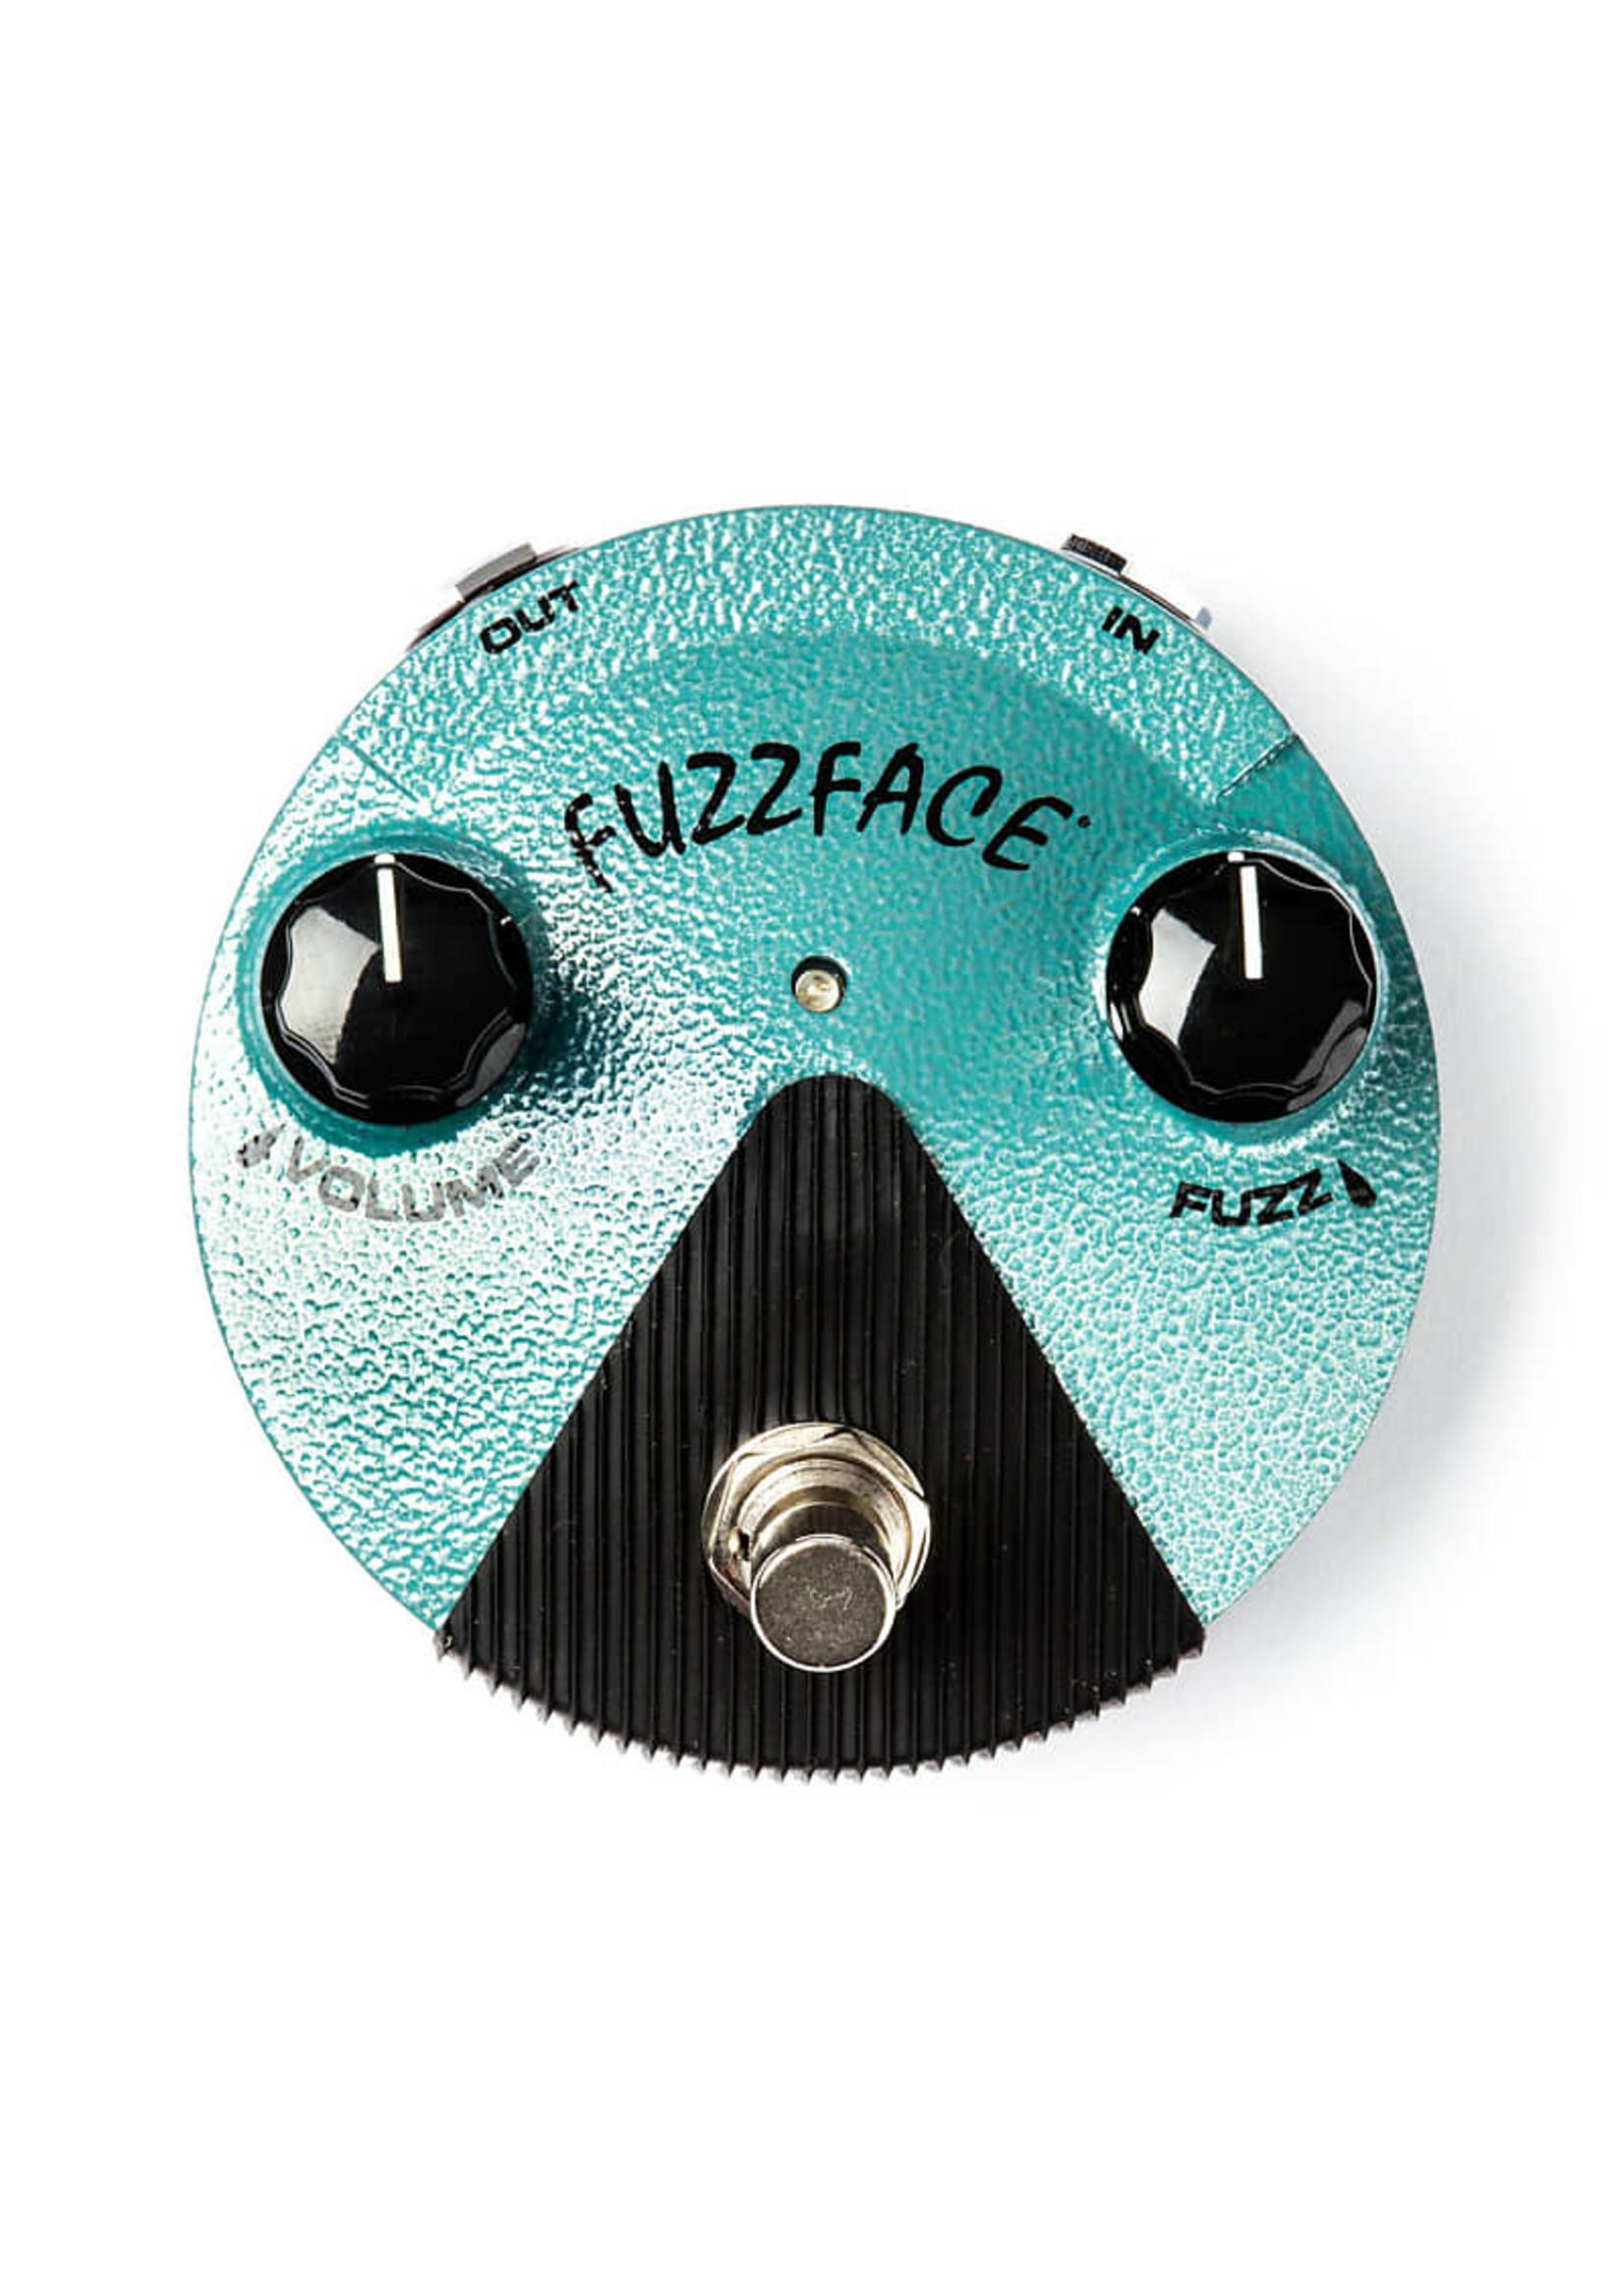 Dunlop Dunlop FFM3 Jimi Hendrix Fuzz Face Mini